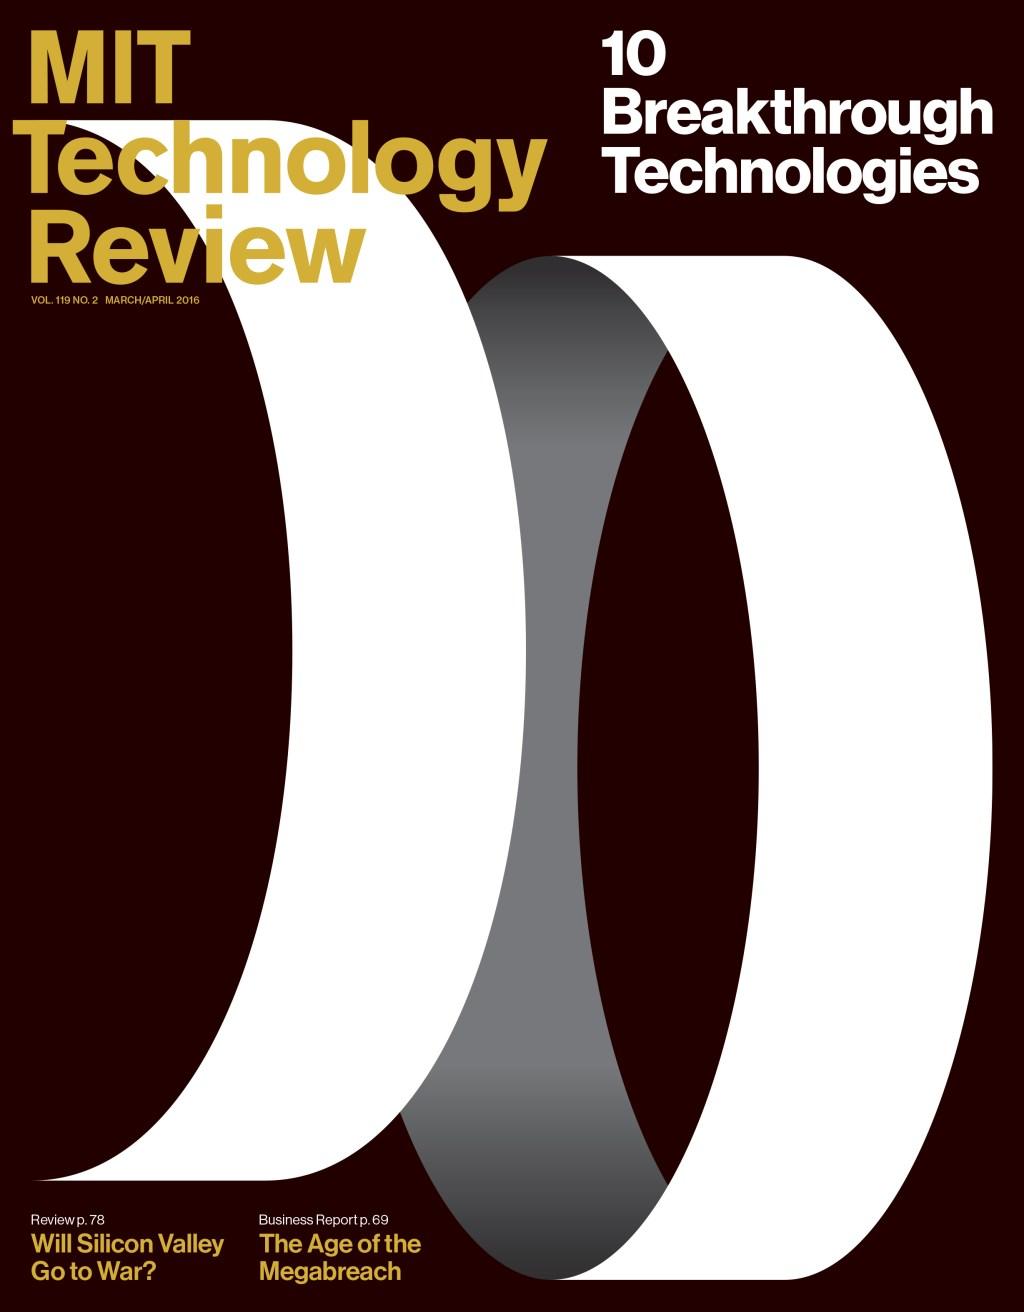 10 Breakthrough Technologies 2016